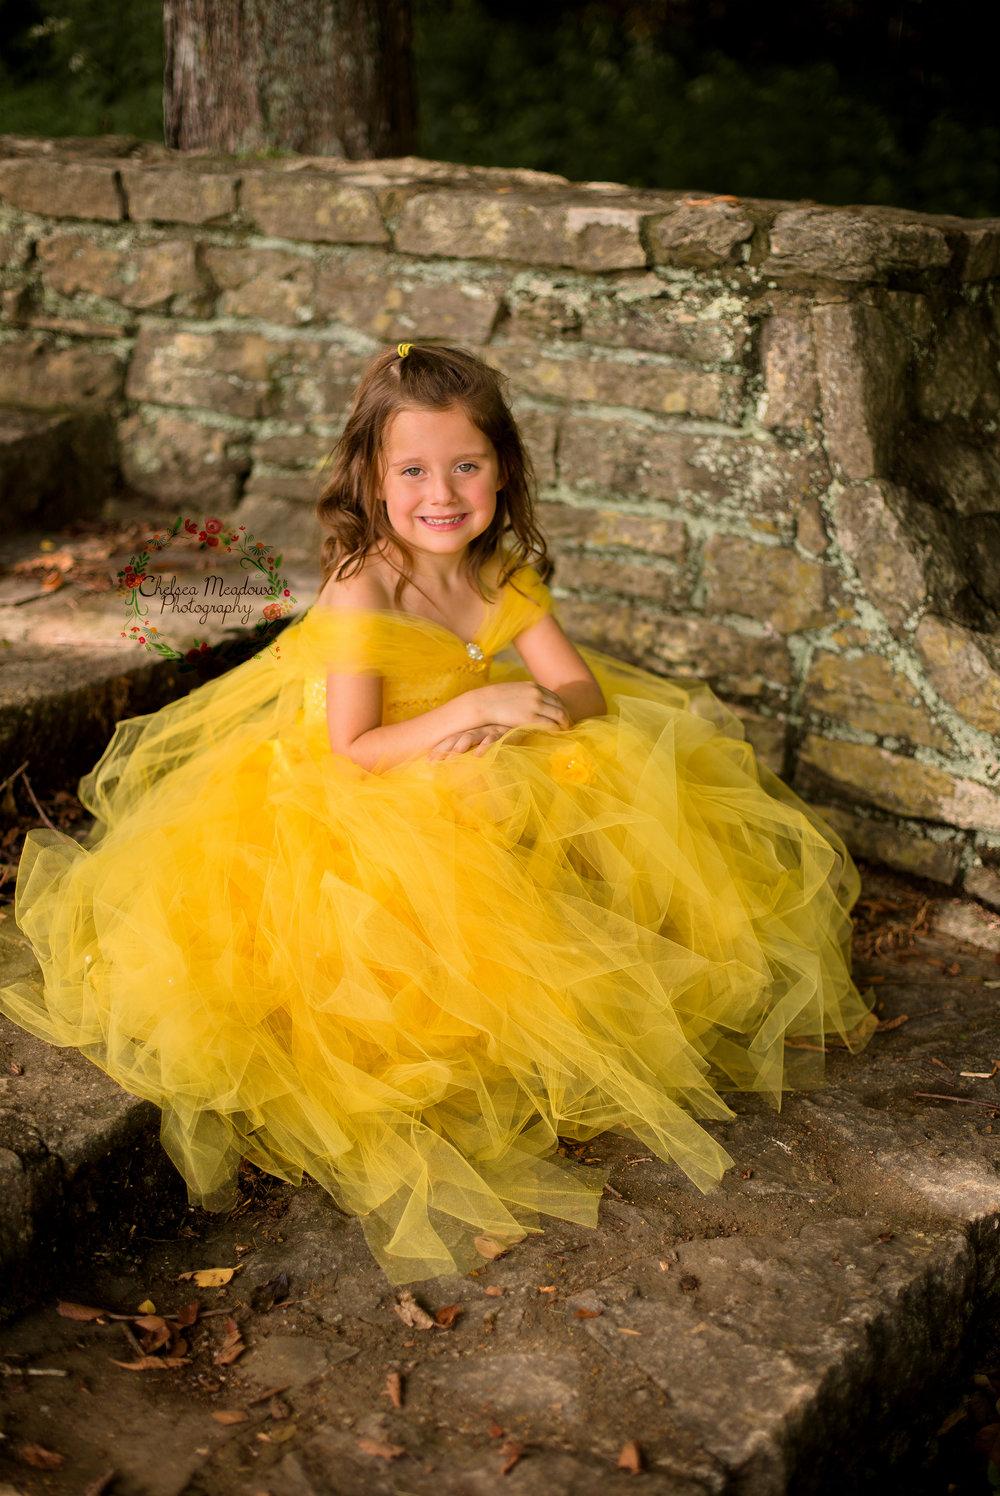 April 6th Birthday - Nashville Family Photographer - Chelsea Meadows Photography (1).jpg